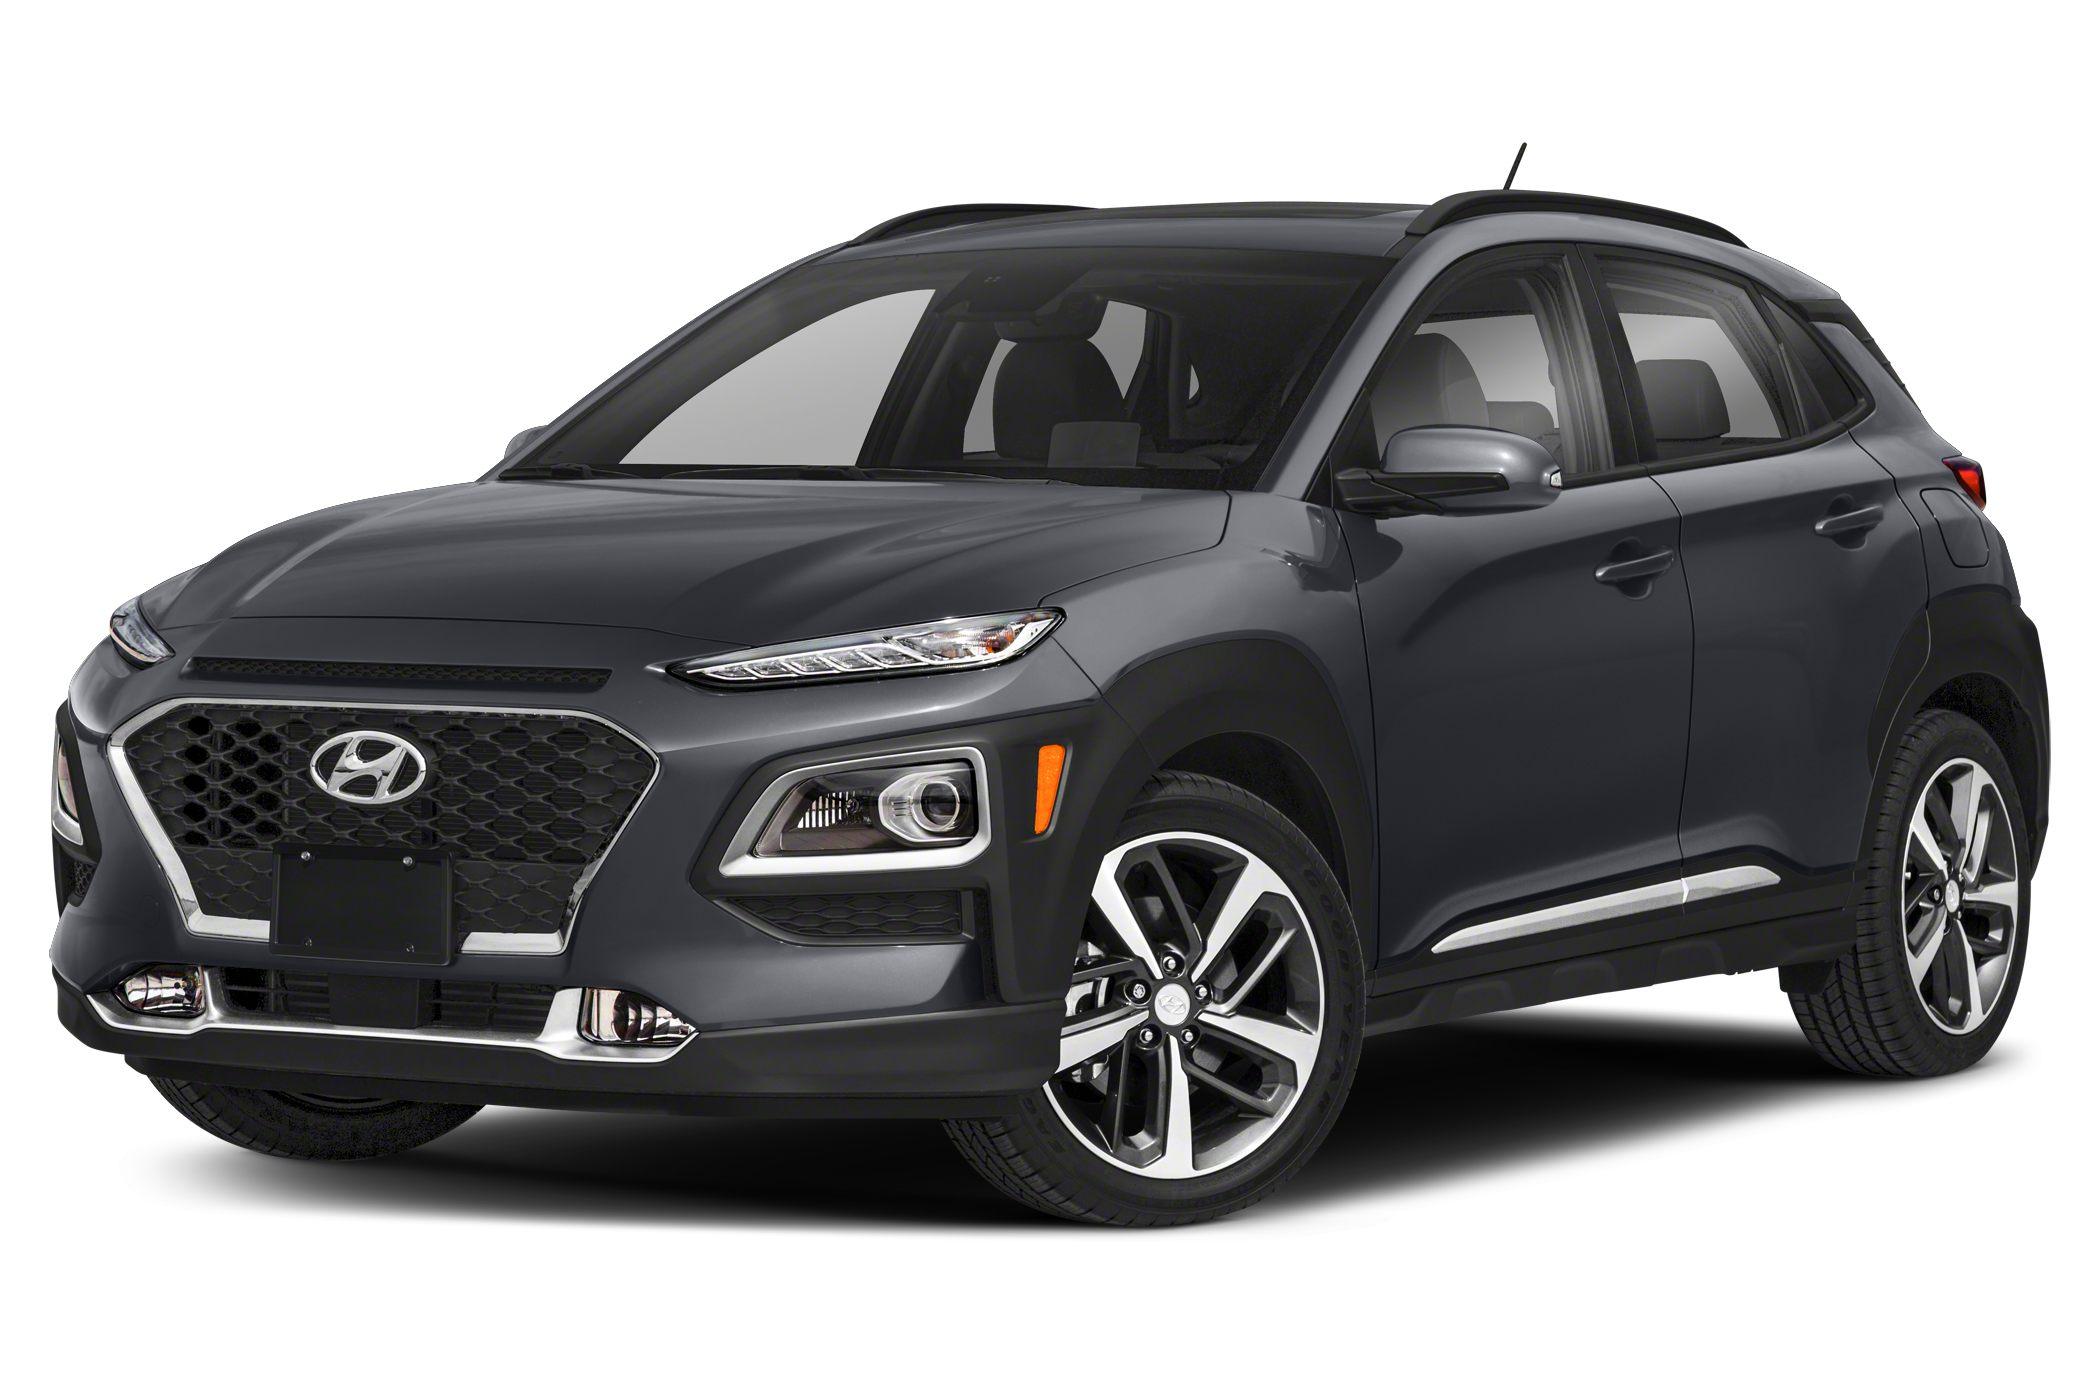 2019 Hyundai Kona Electric starts under $30,000 with tax credit